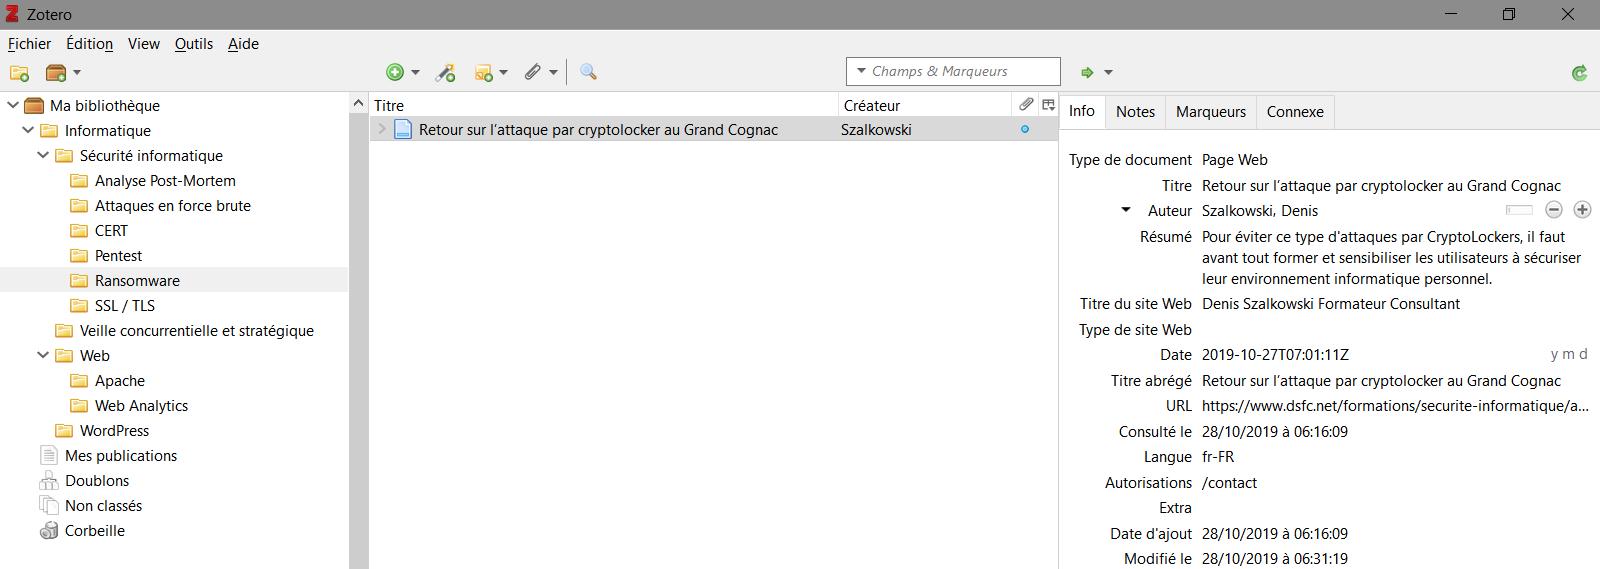 Zotero, un outil de bookmarking utile au SEO ?